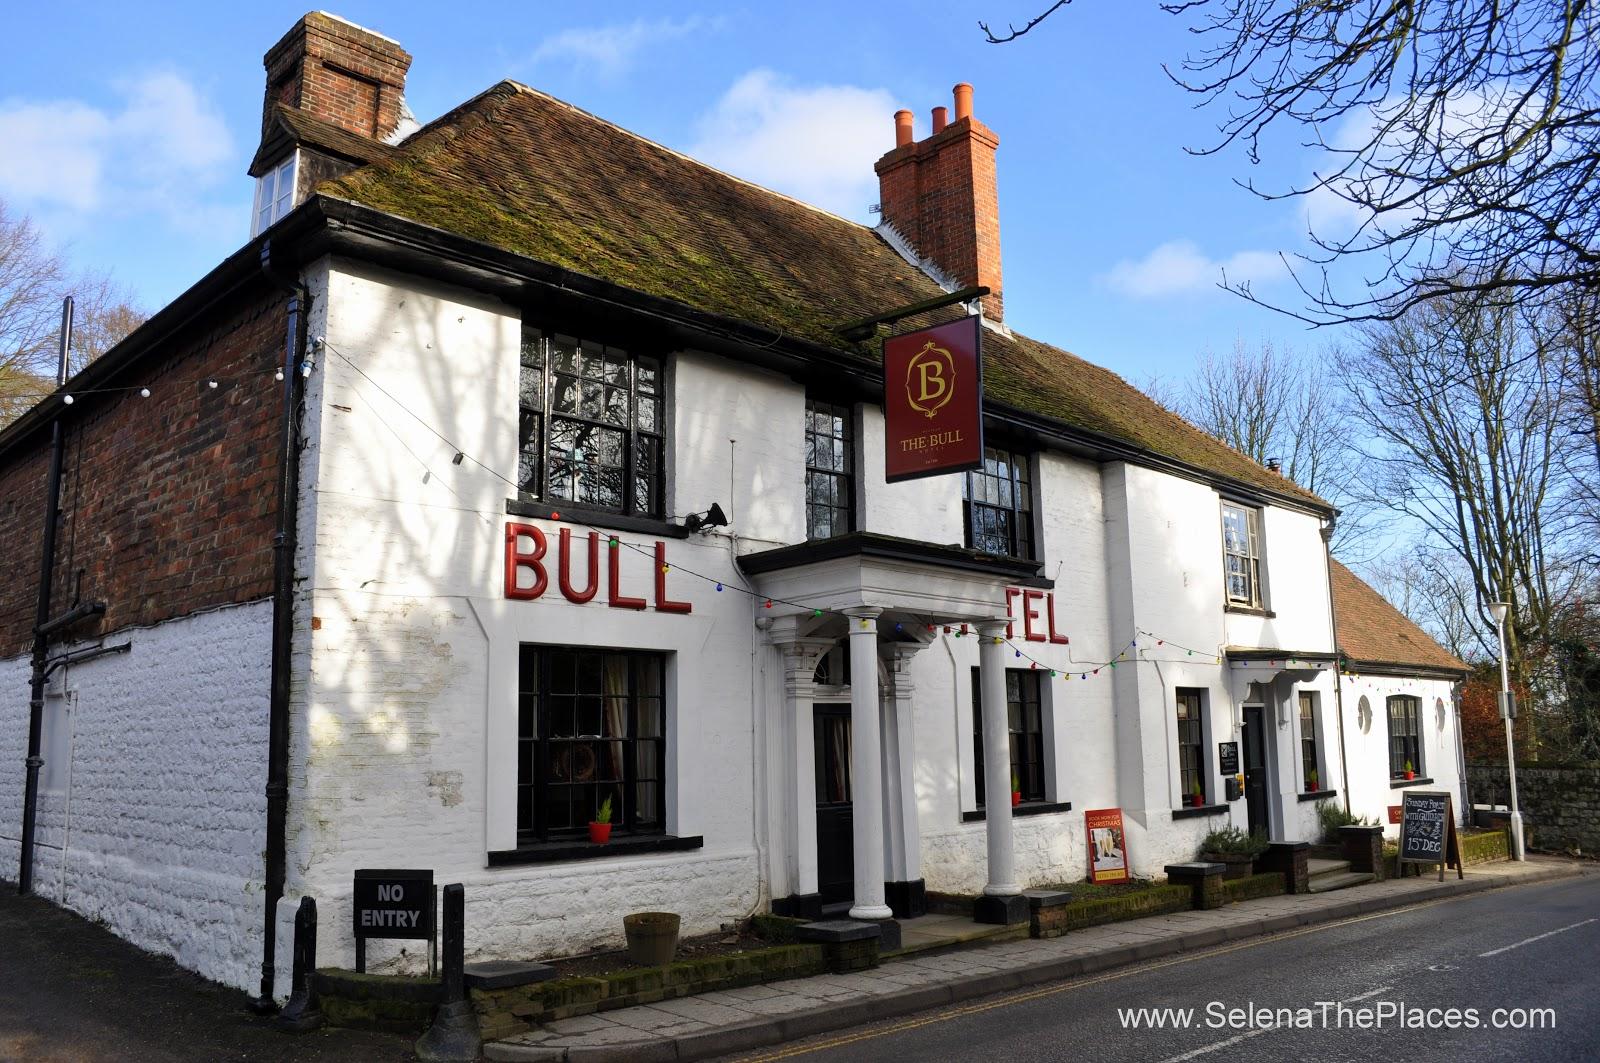 The Bull in Wrotham, Kent